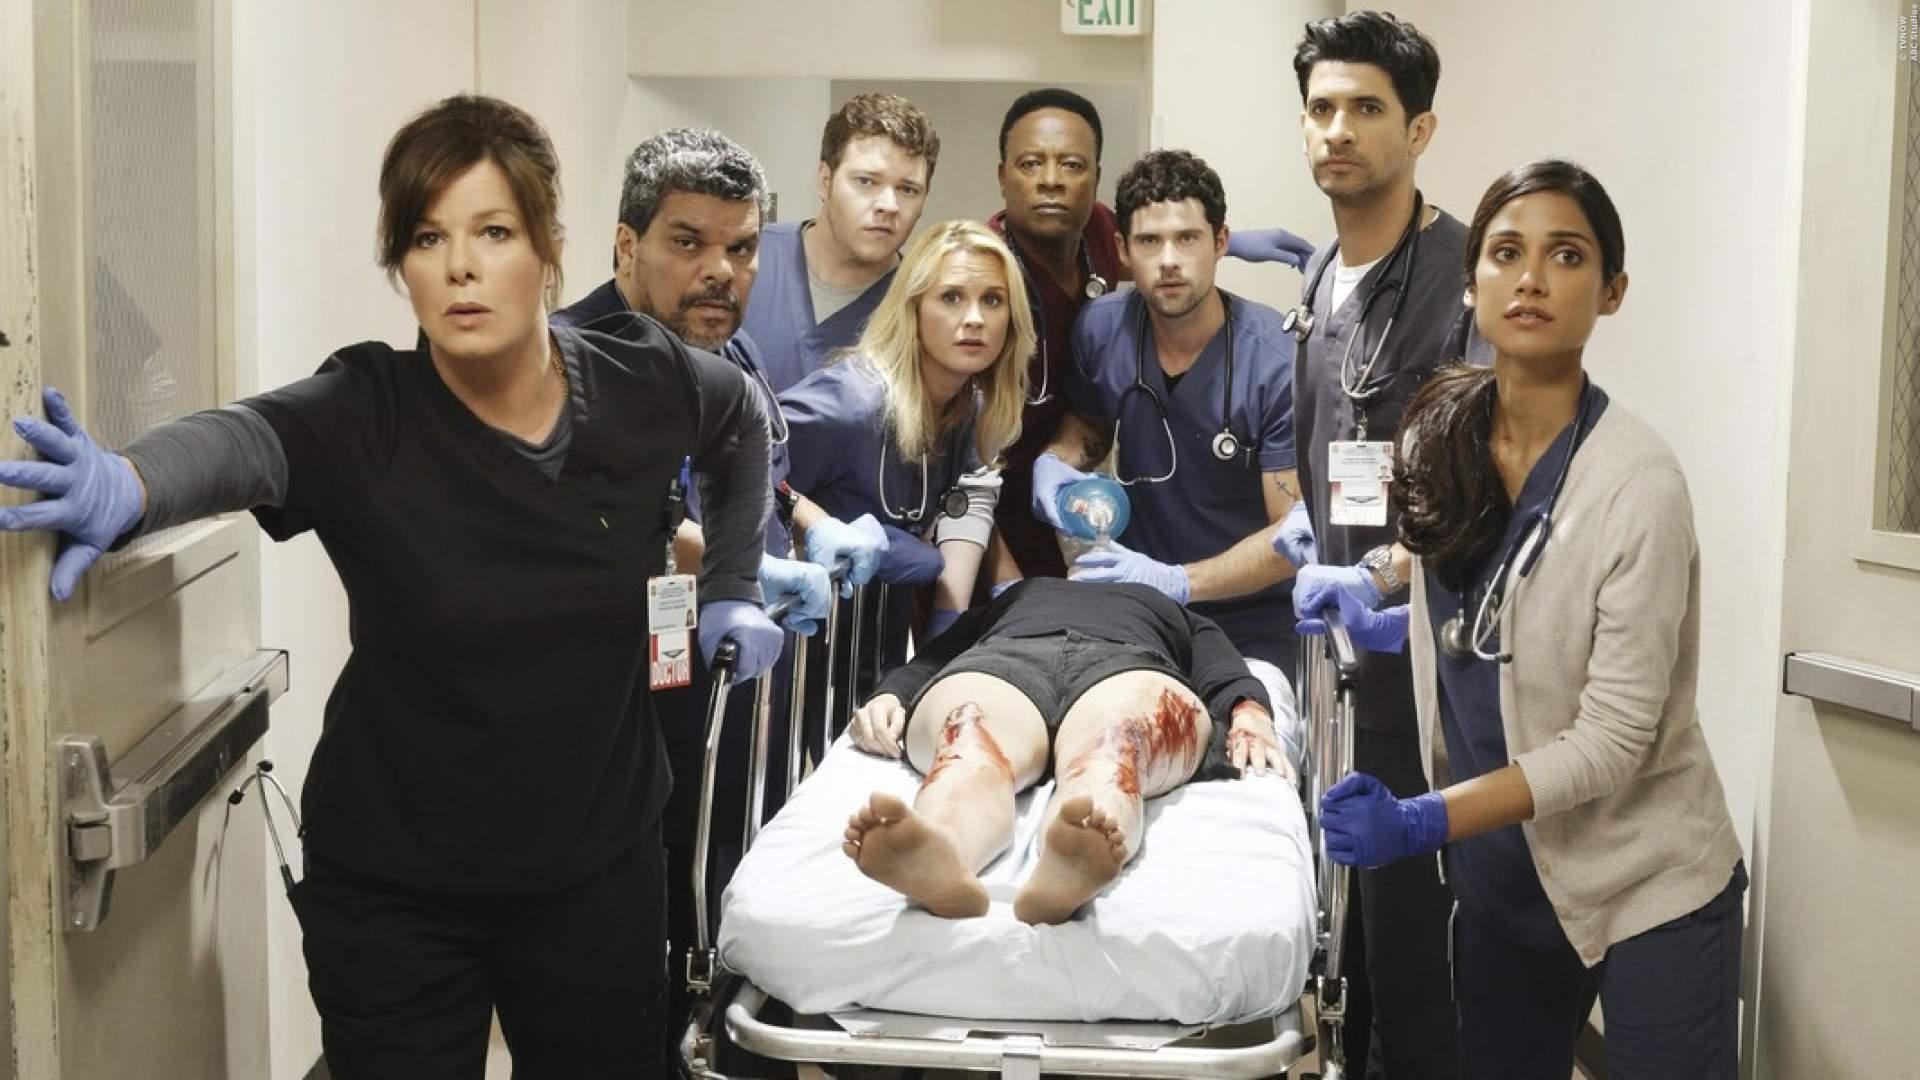 Code Black: Staffel 1-3 bei TVNOW